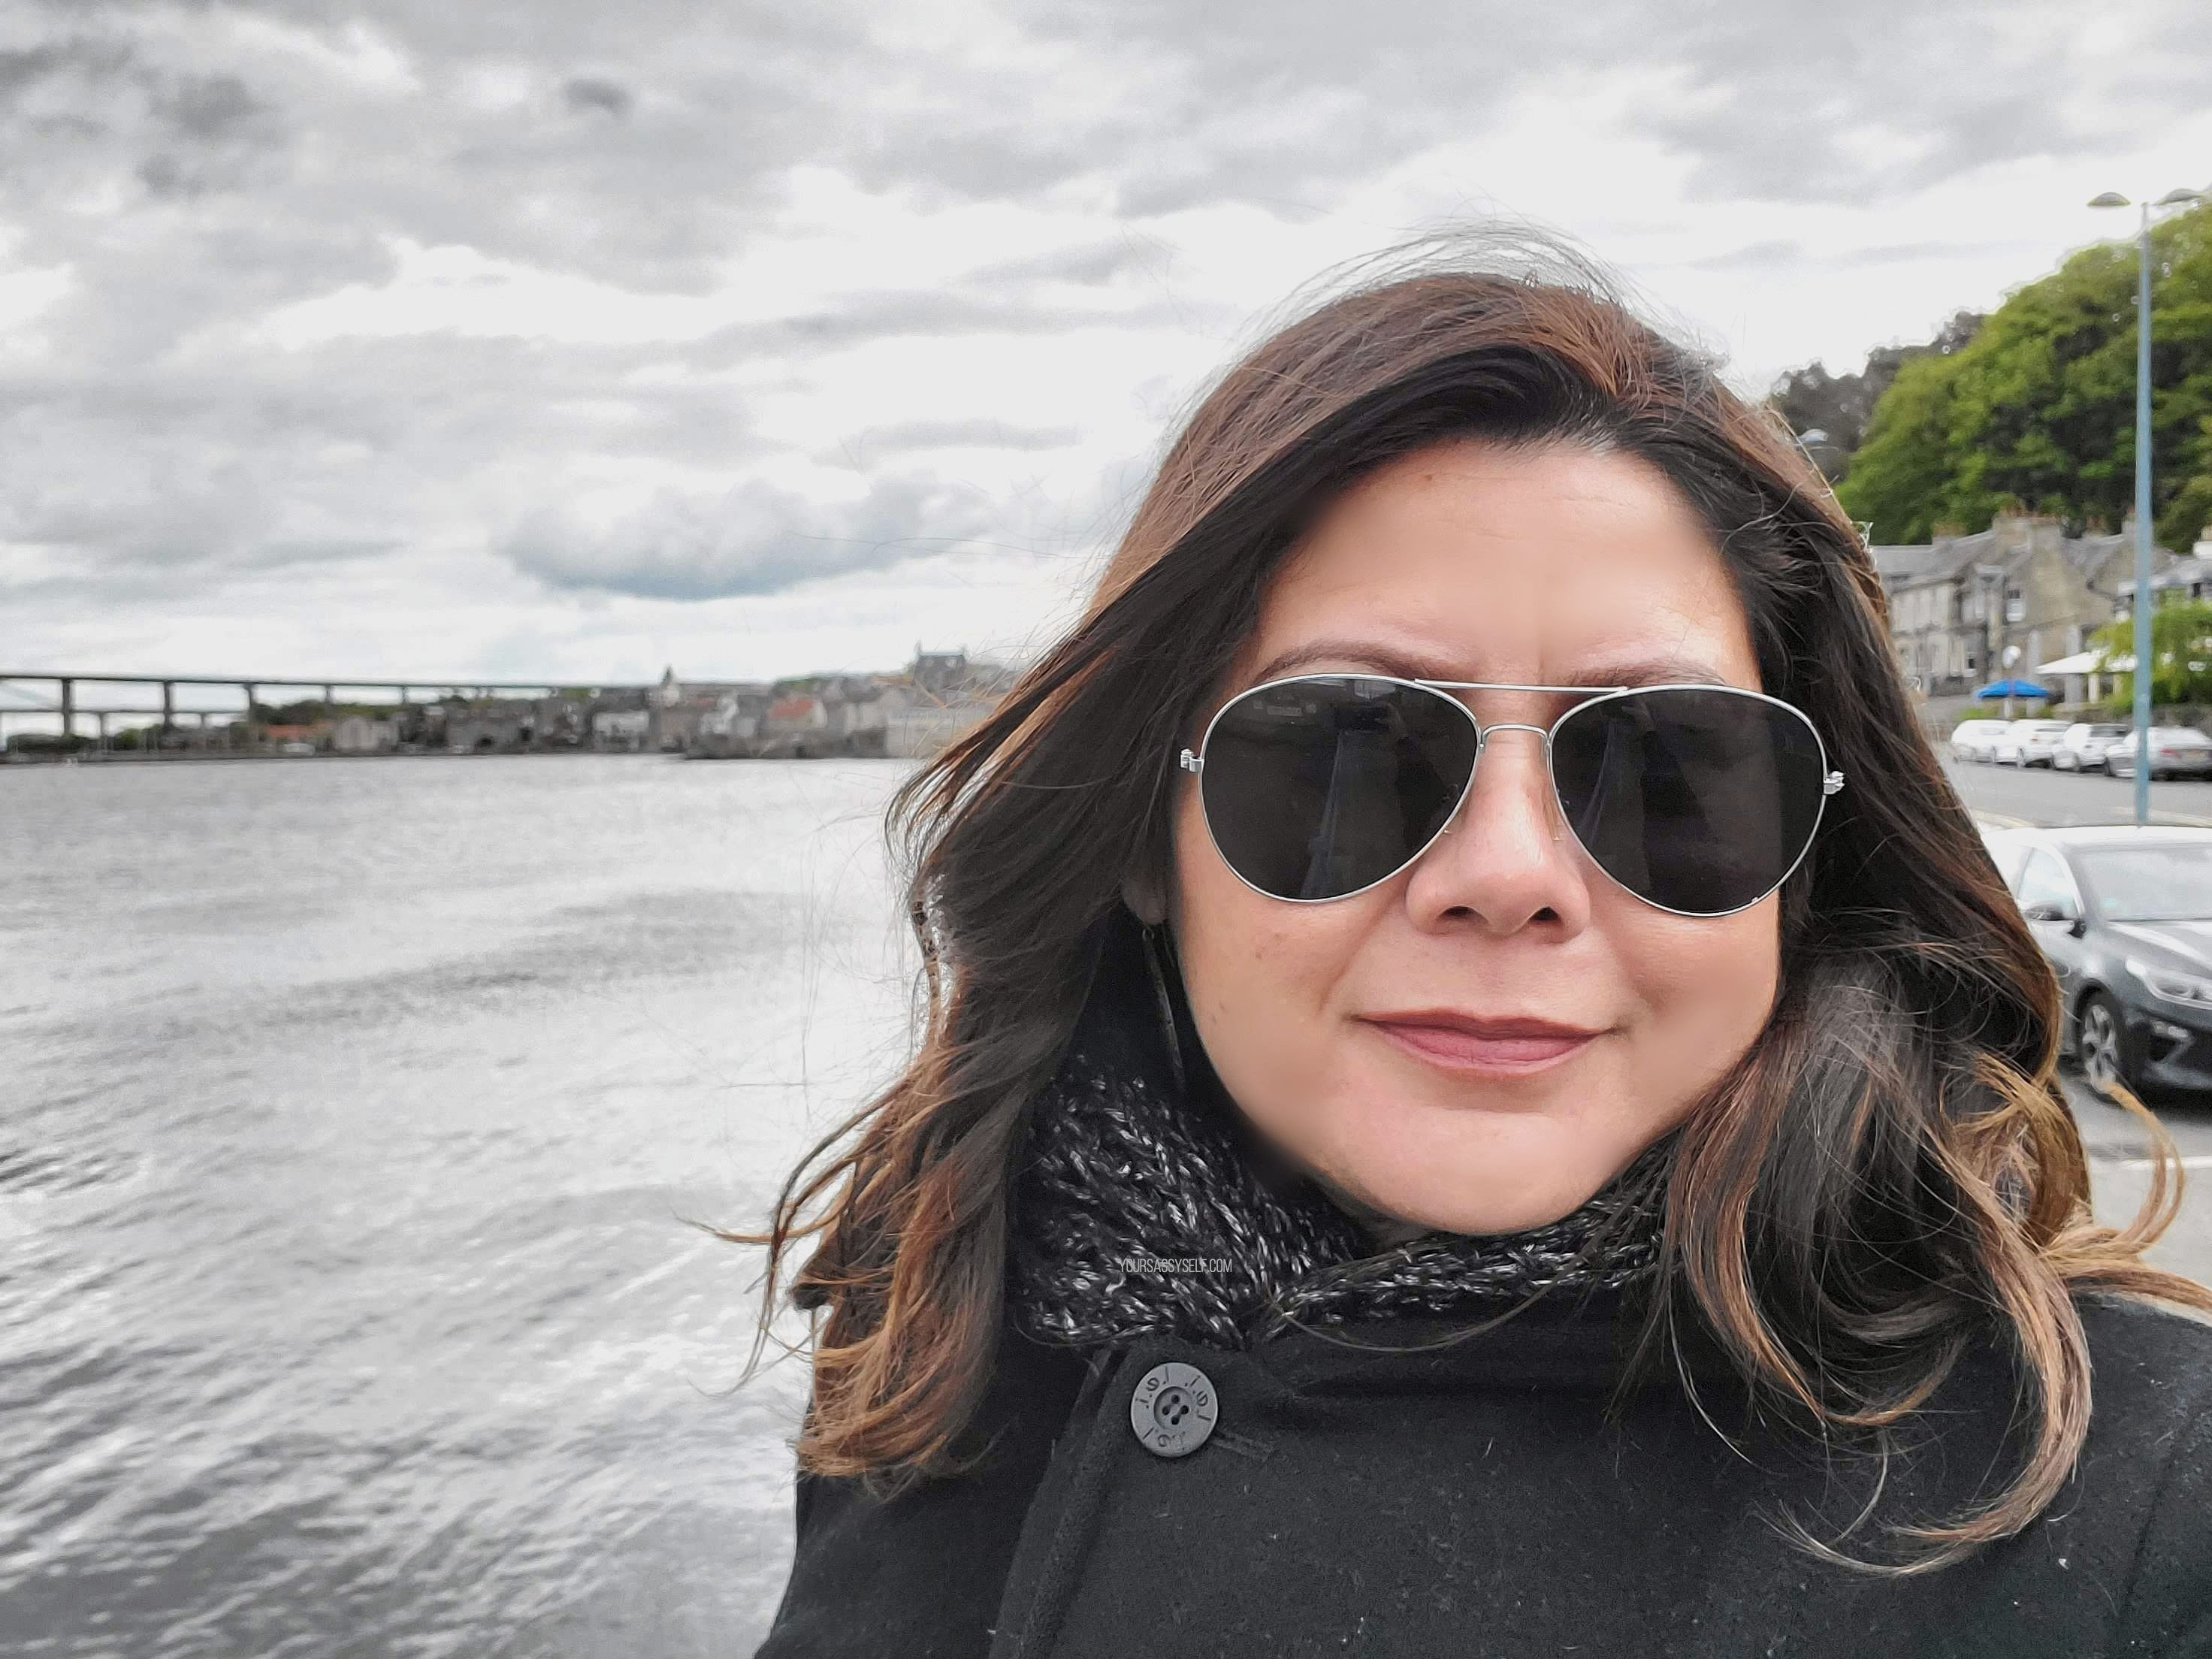 Rocio - Your Sassy Self by Forth Bridge - Edinburgh - yoursassyself.com